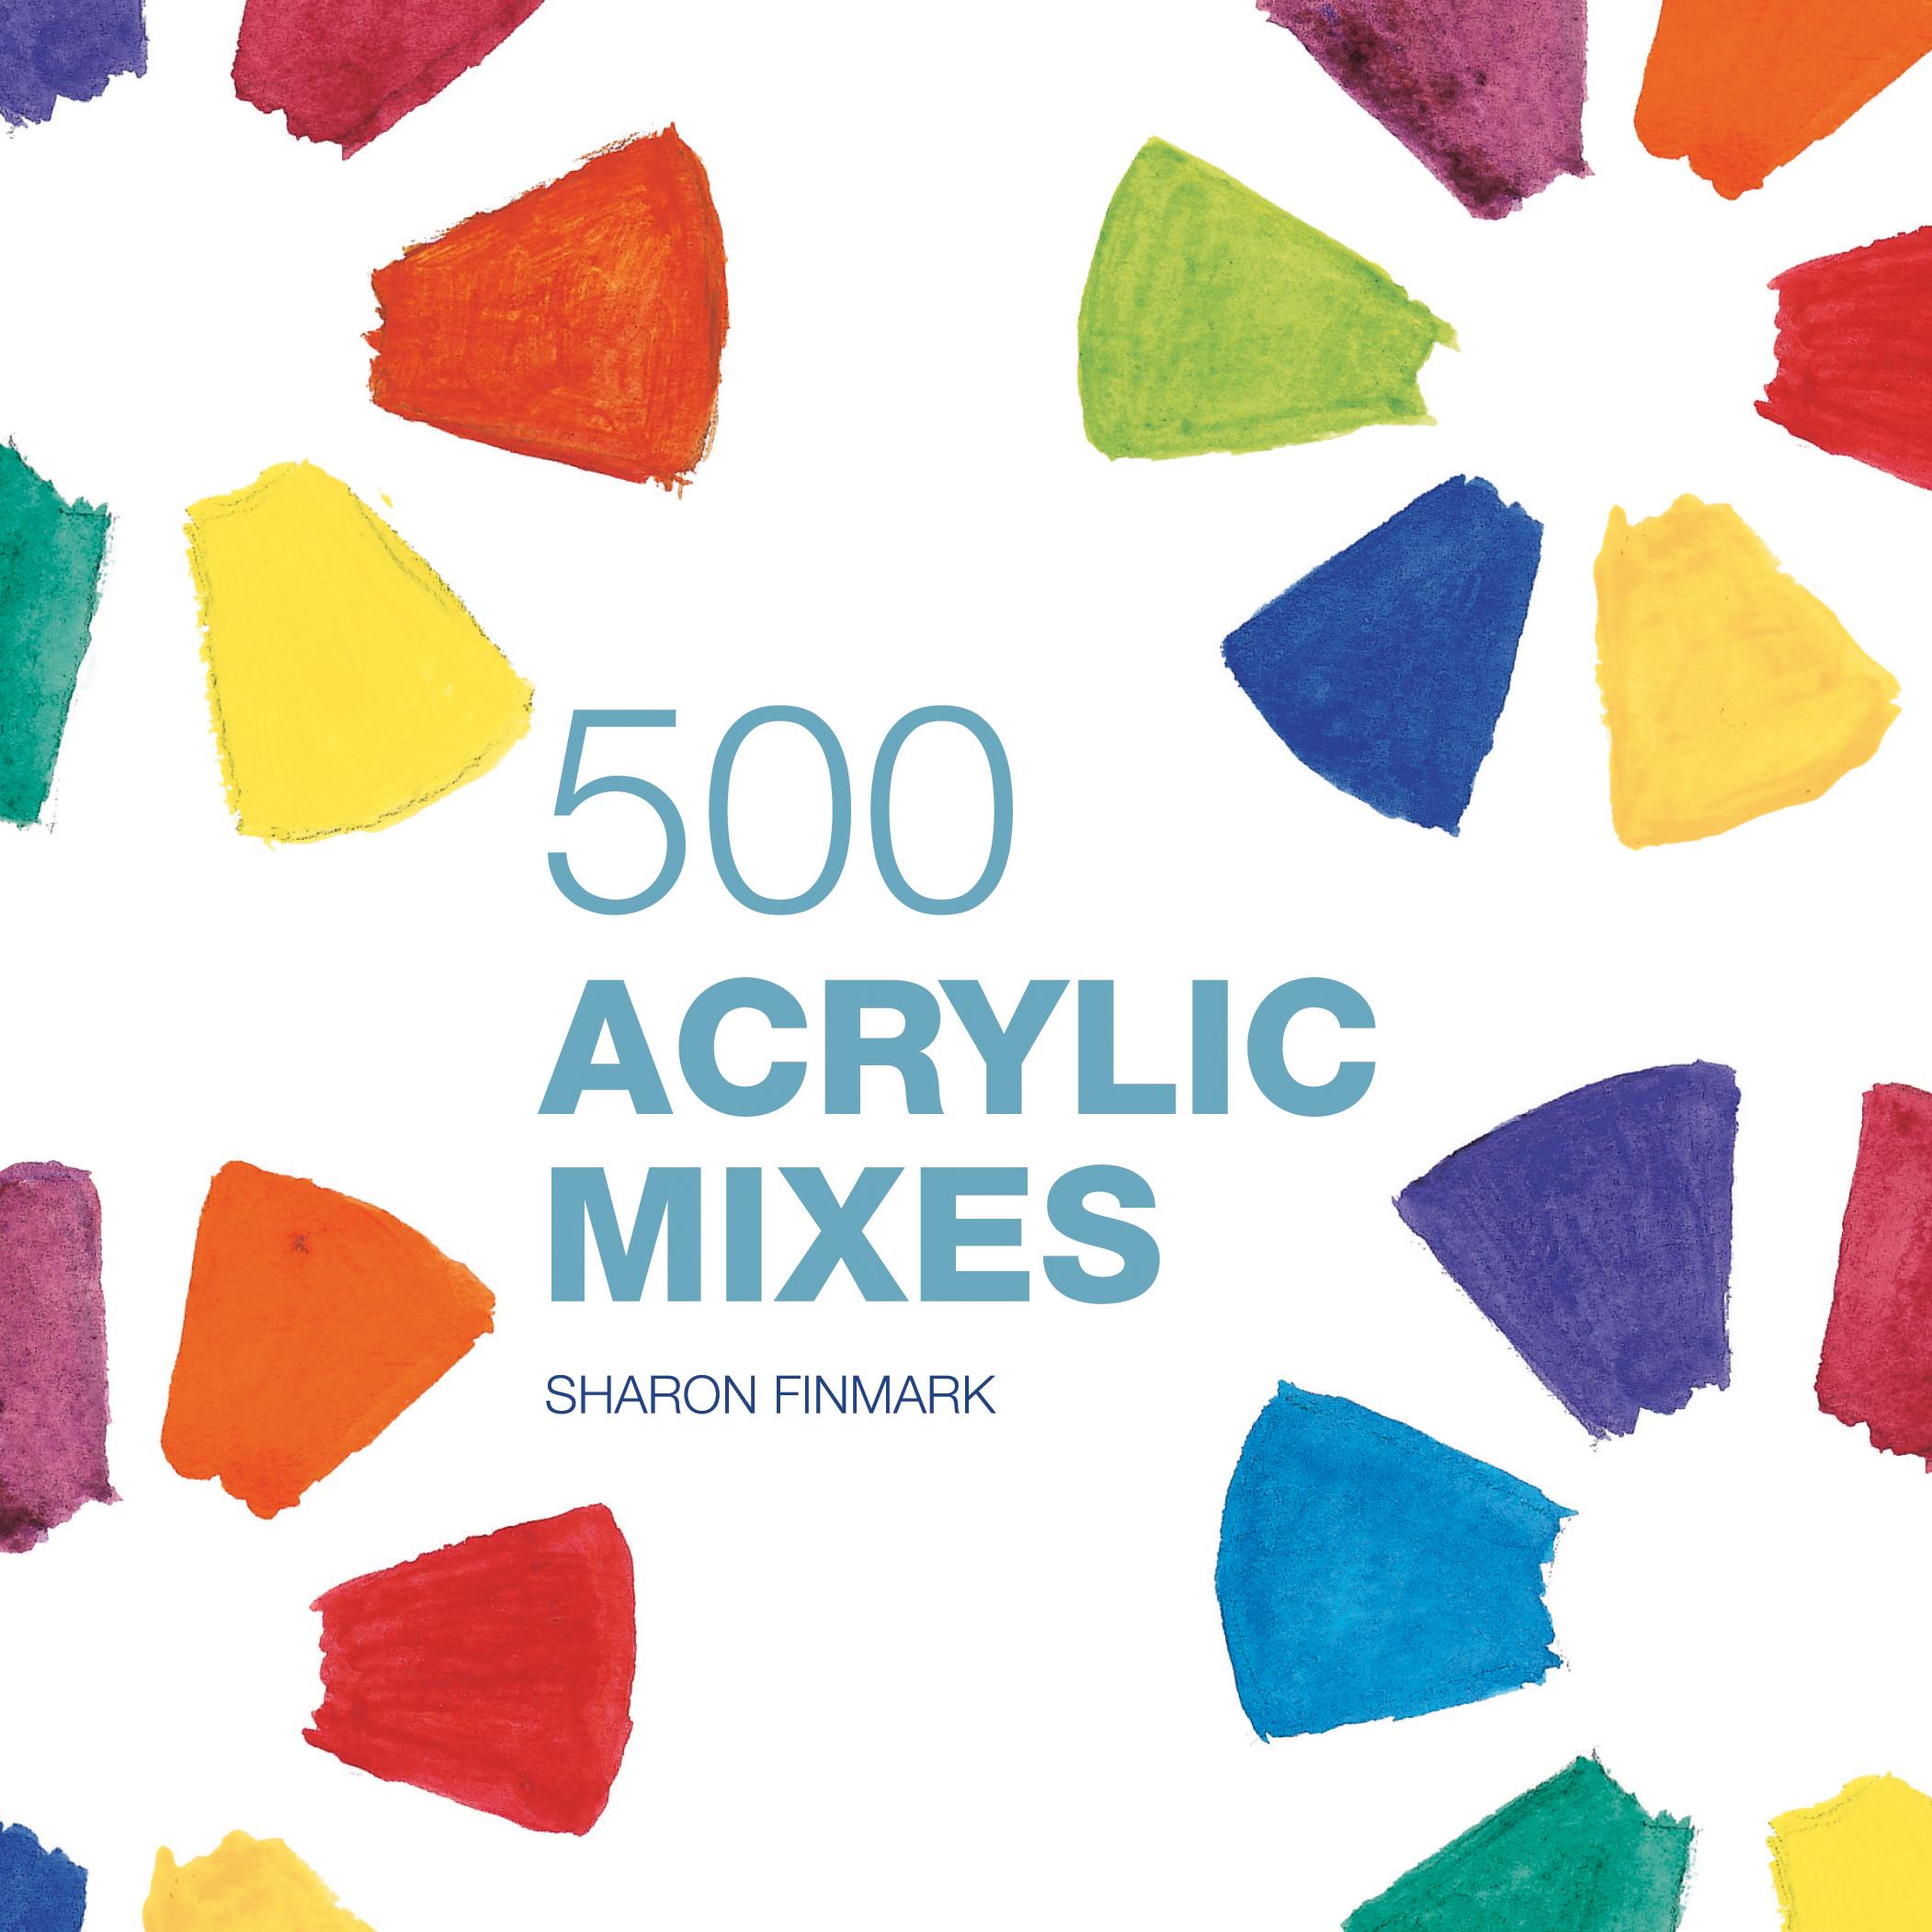 500 Acrylic Mixes